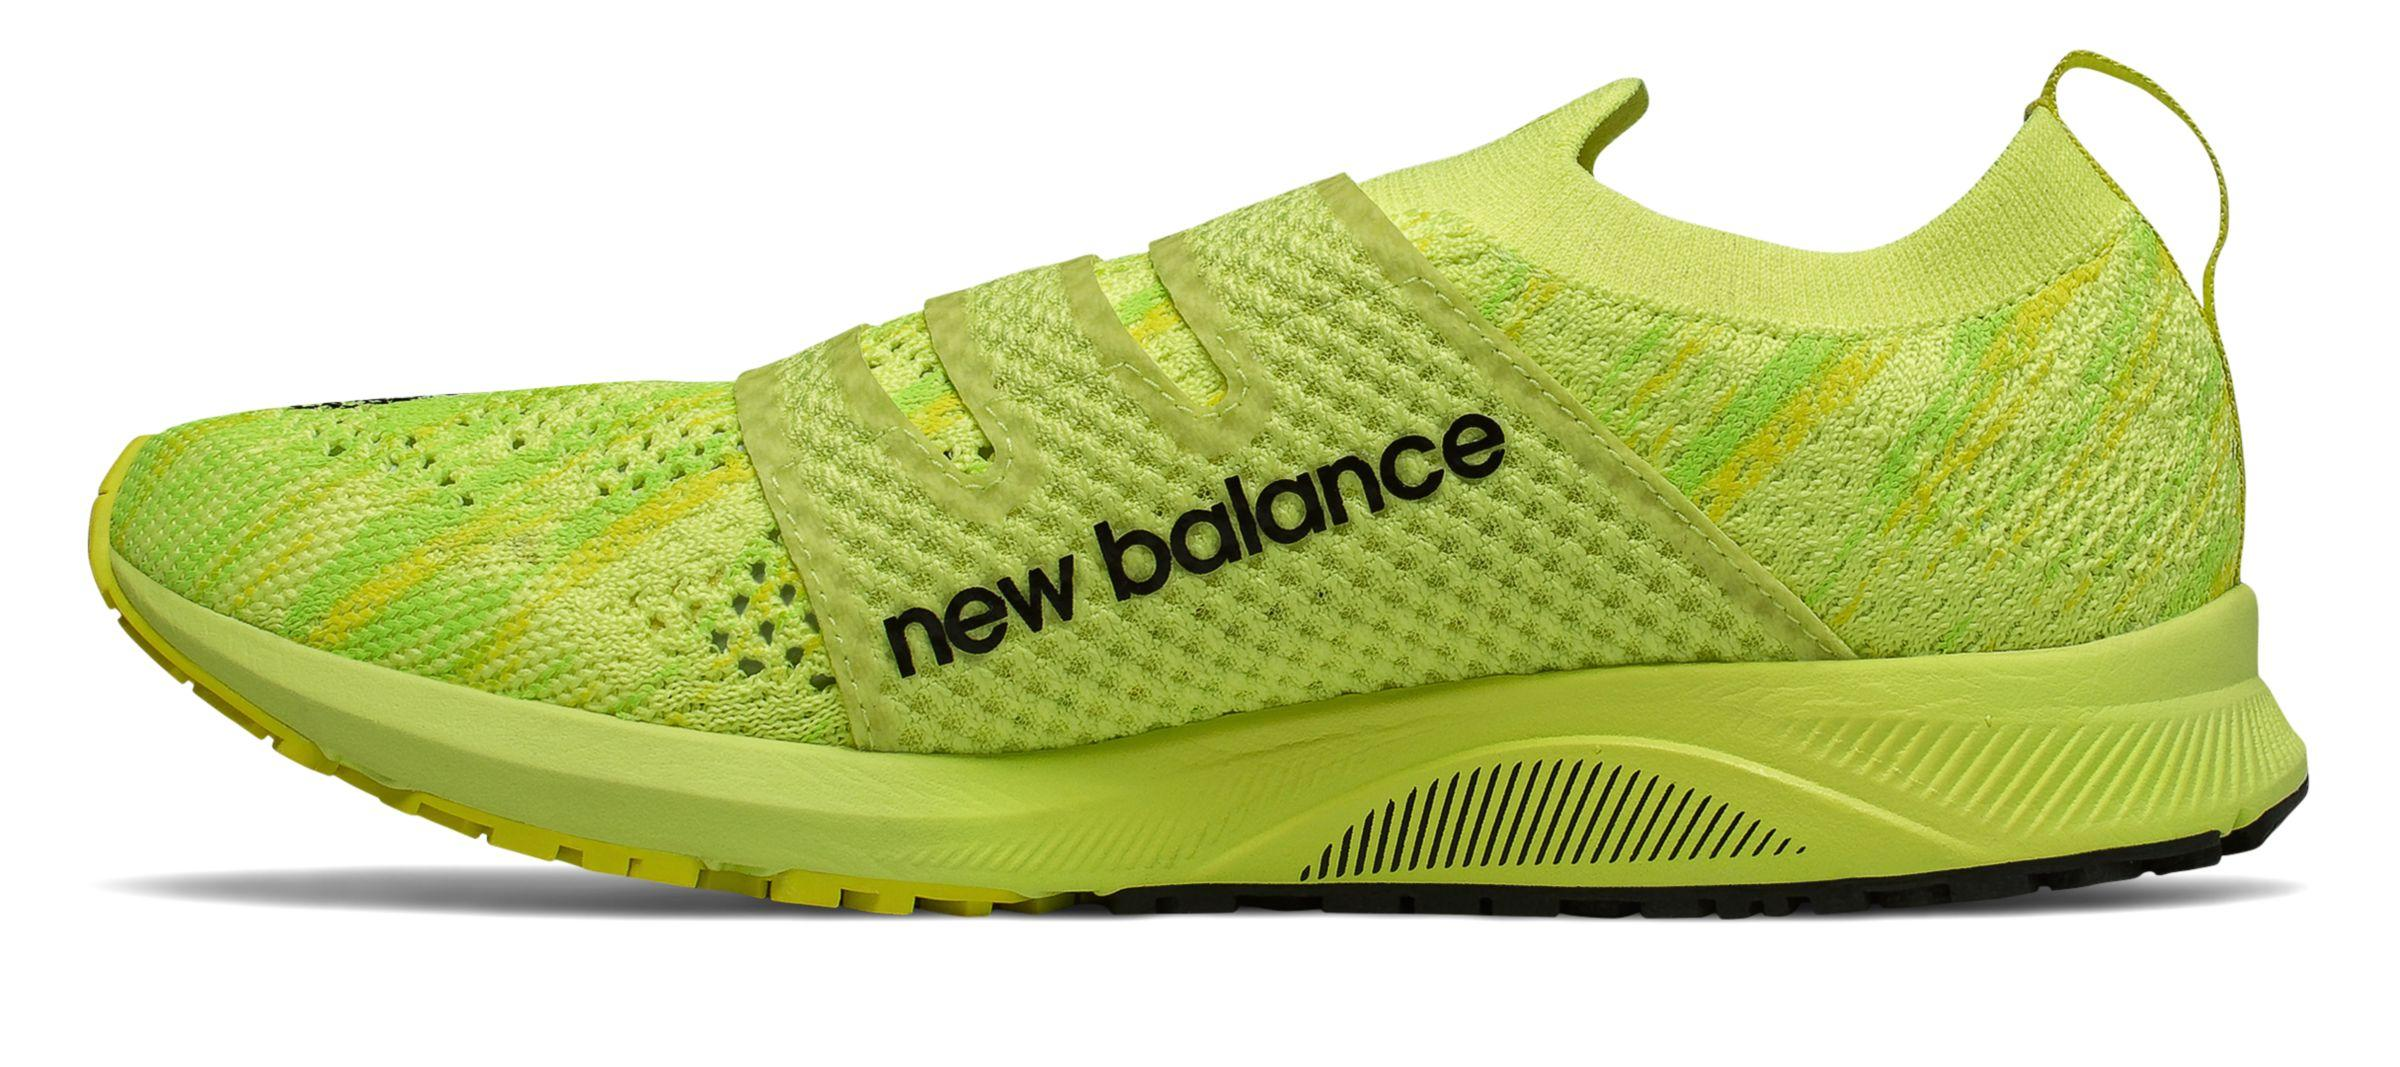 new balance 1500t2